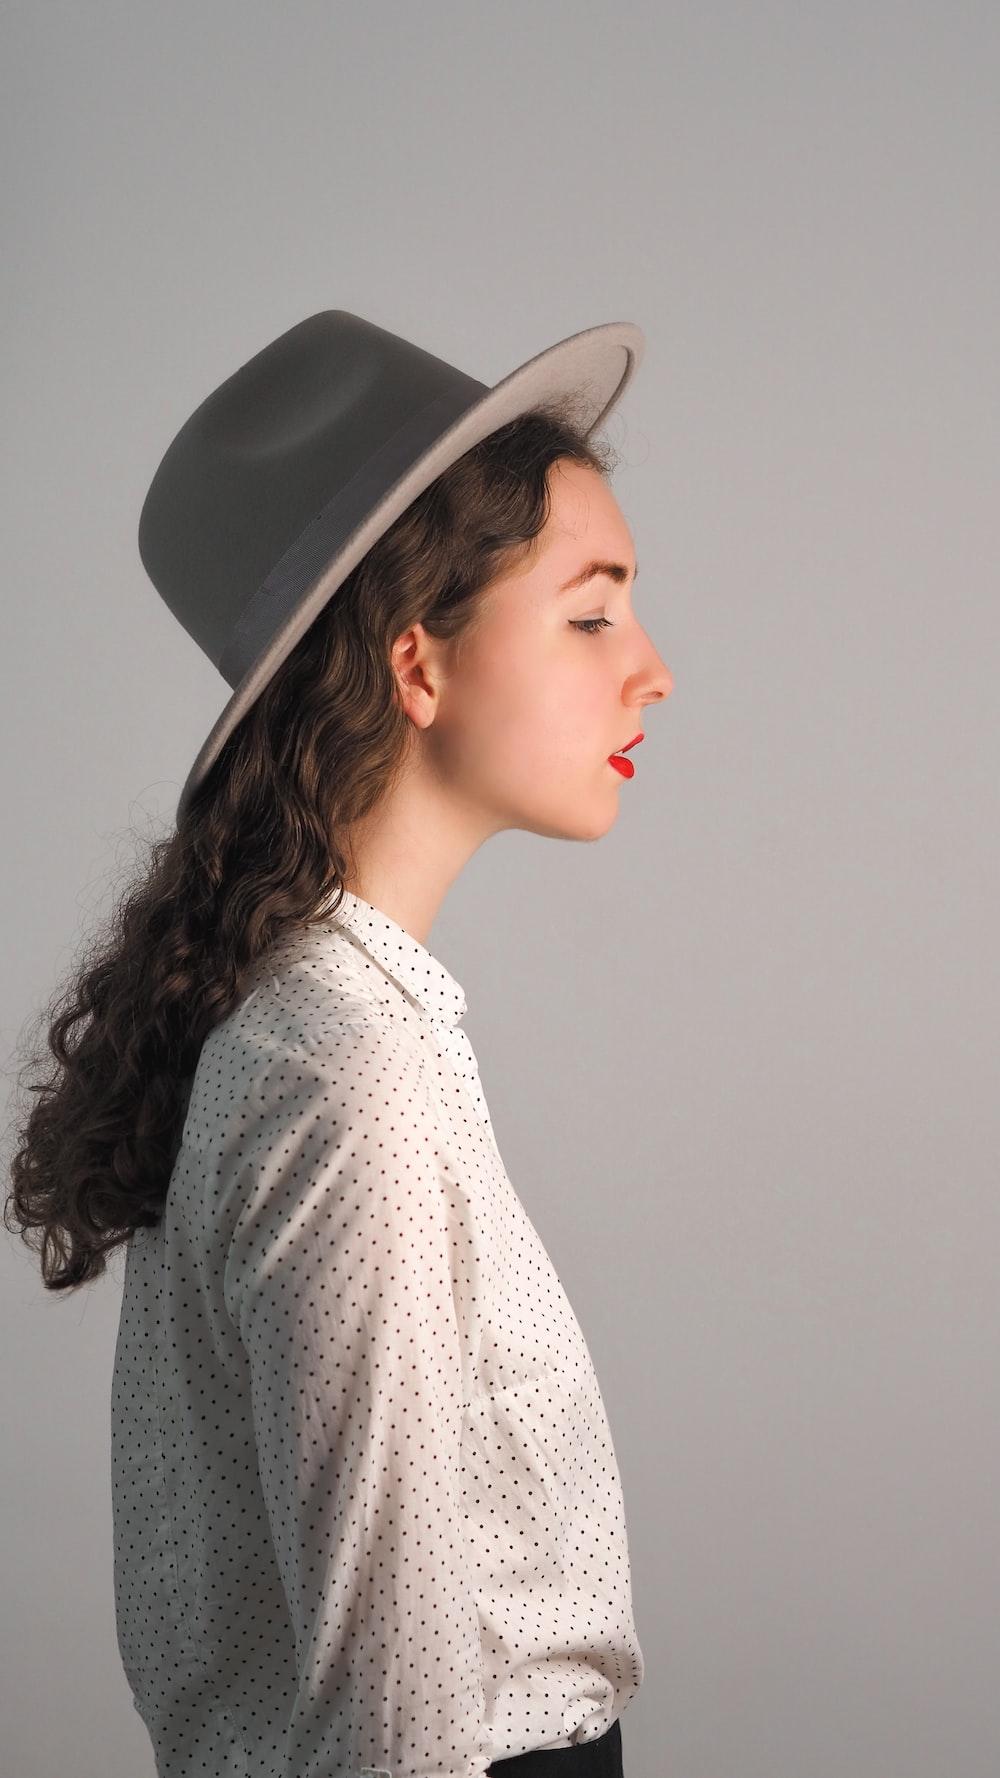 woman in white and black polka dot shirt wearing black hat